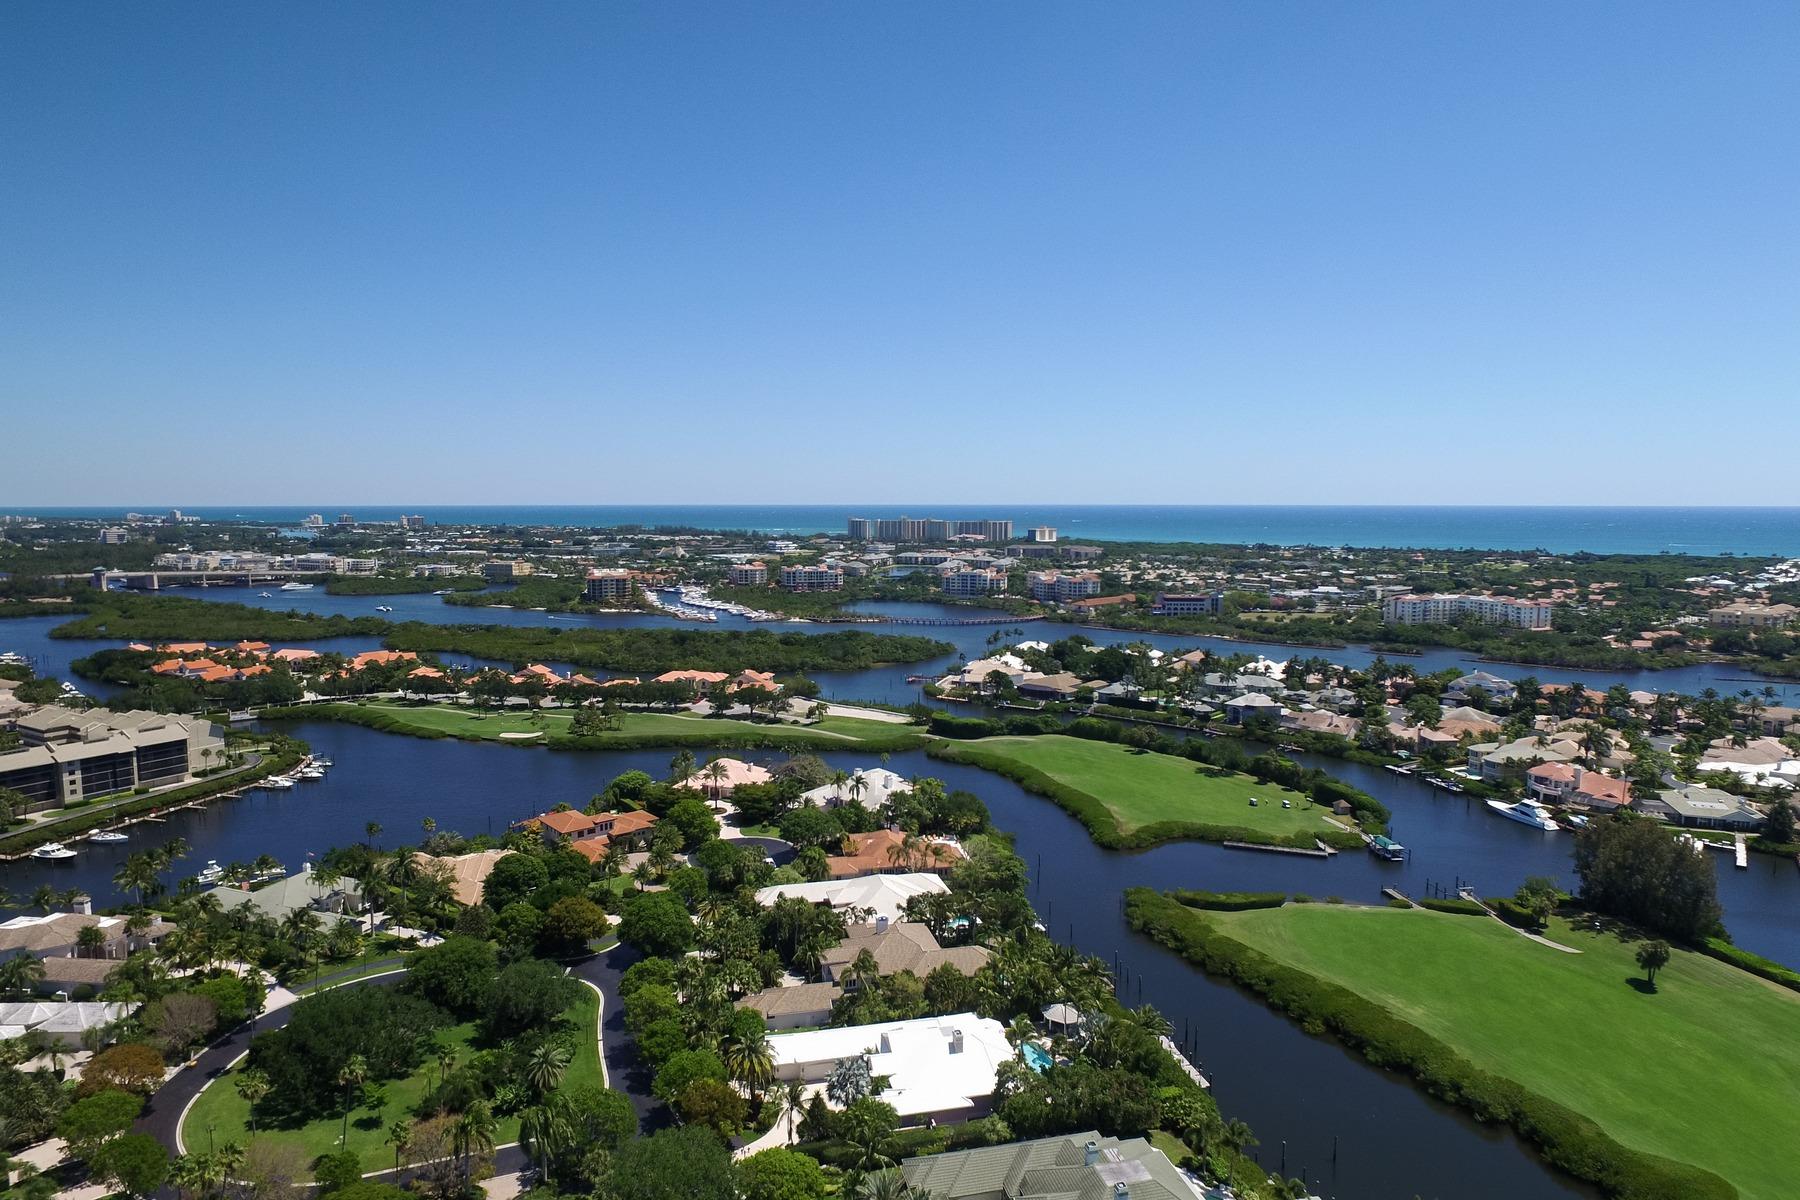 Single Family Home for Sale at 3404 Barrow Island Jonathans Landing, Jupiter, Florida, 33477 United States